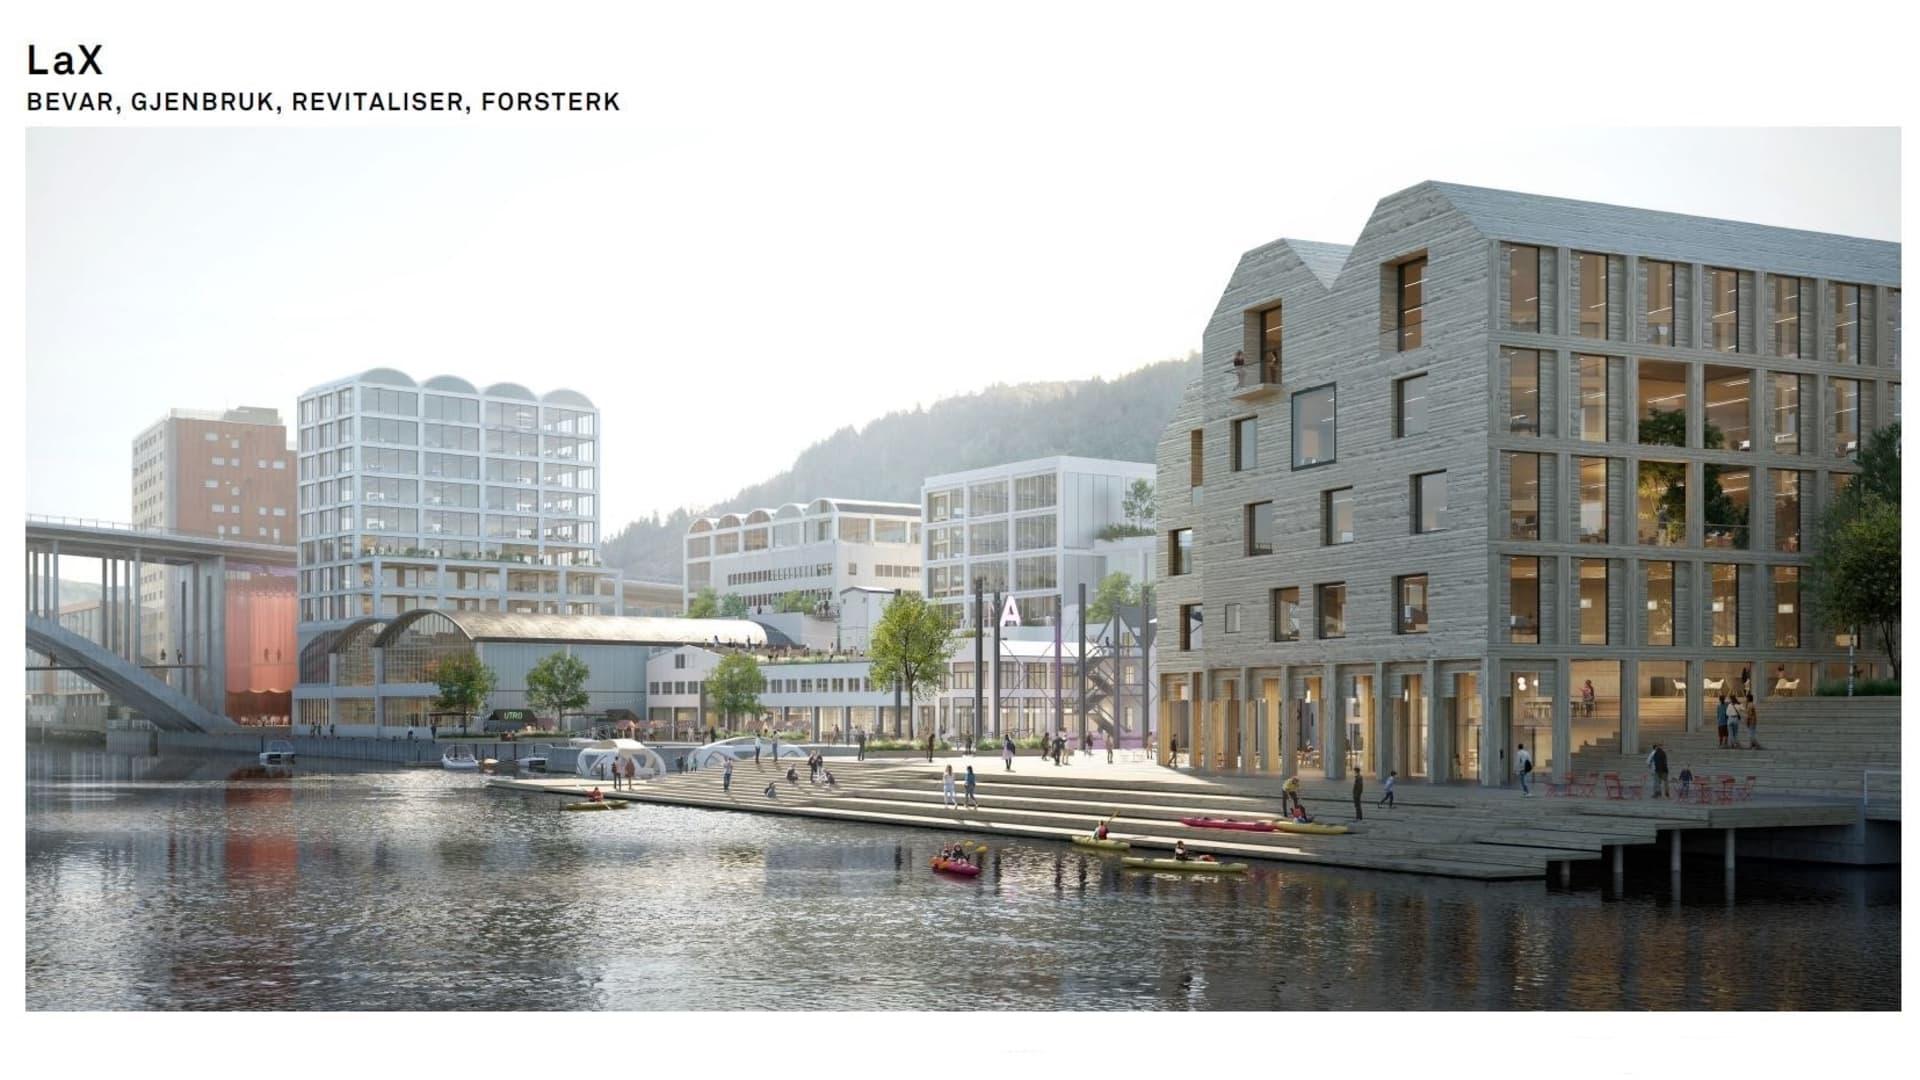 LAX bidrag til arkitektkonkurranse